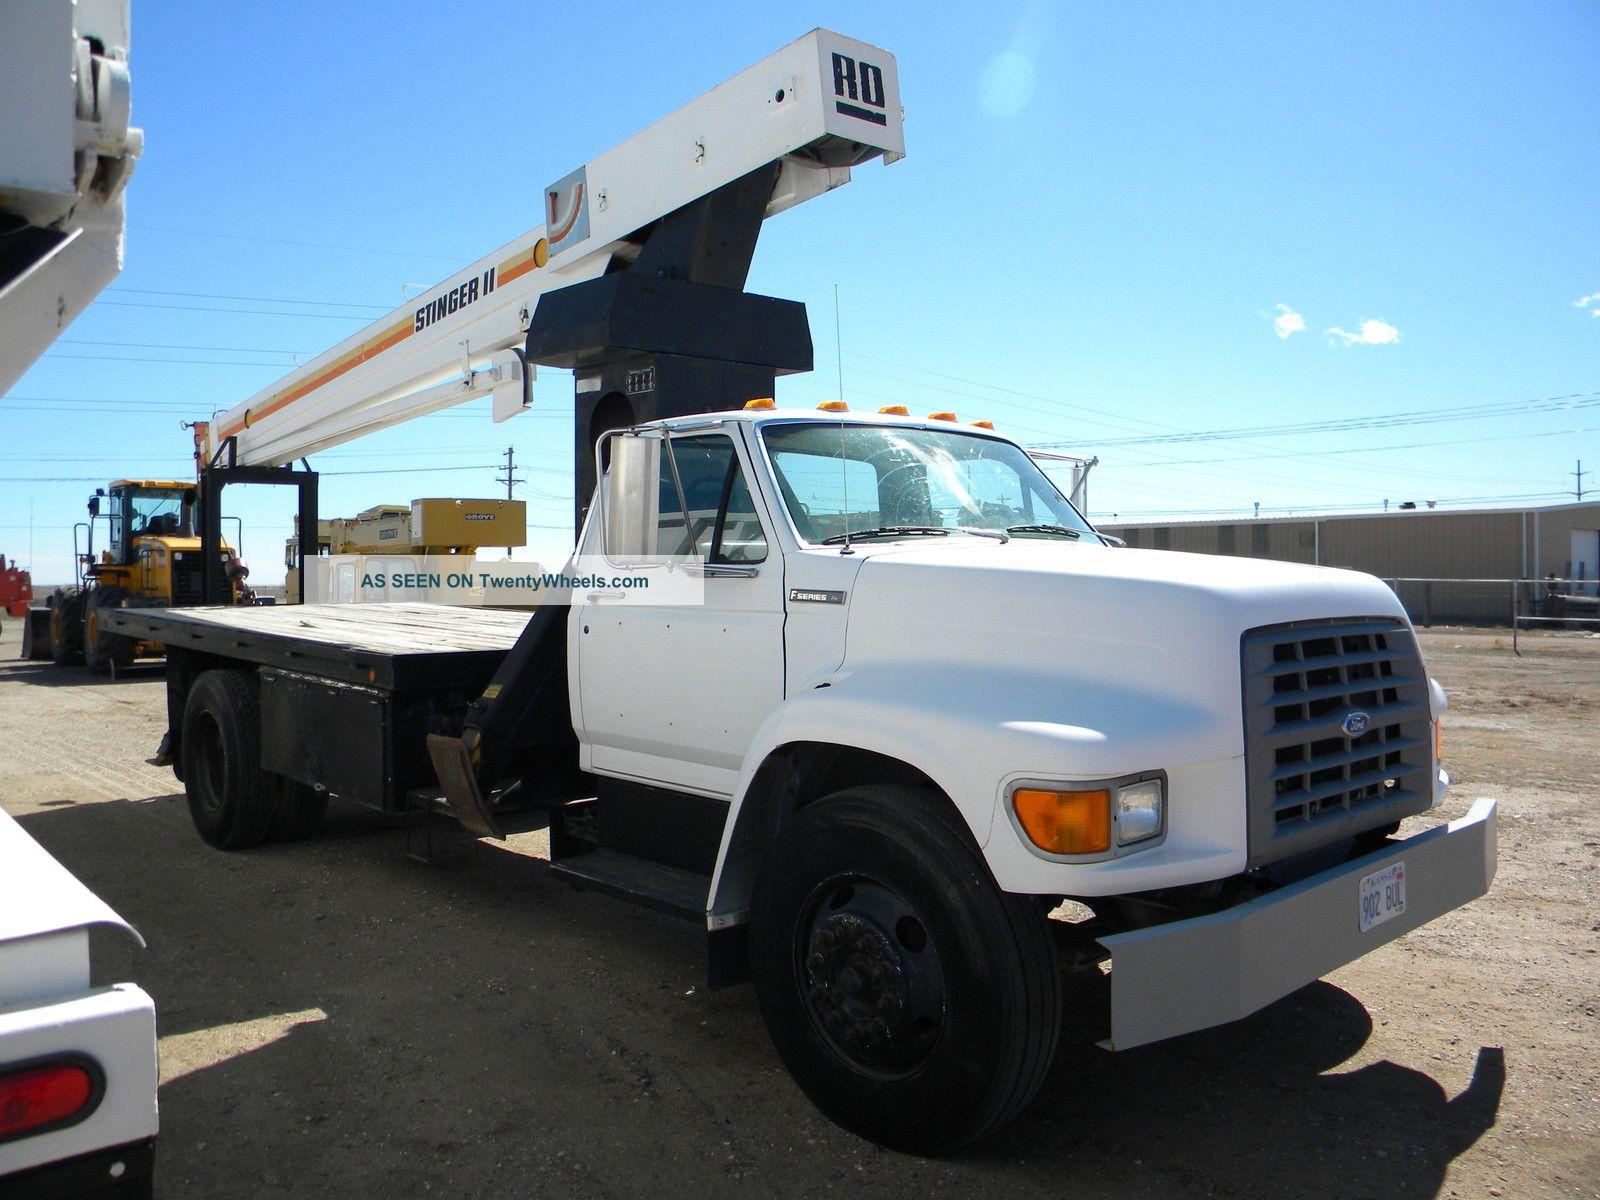 Boom Truck Crane Ford Boom Truck Truck Crane Boom Lift Crane Cranes photo